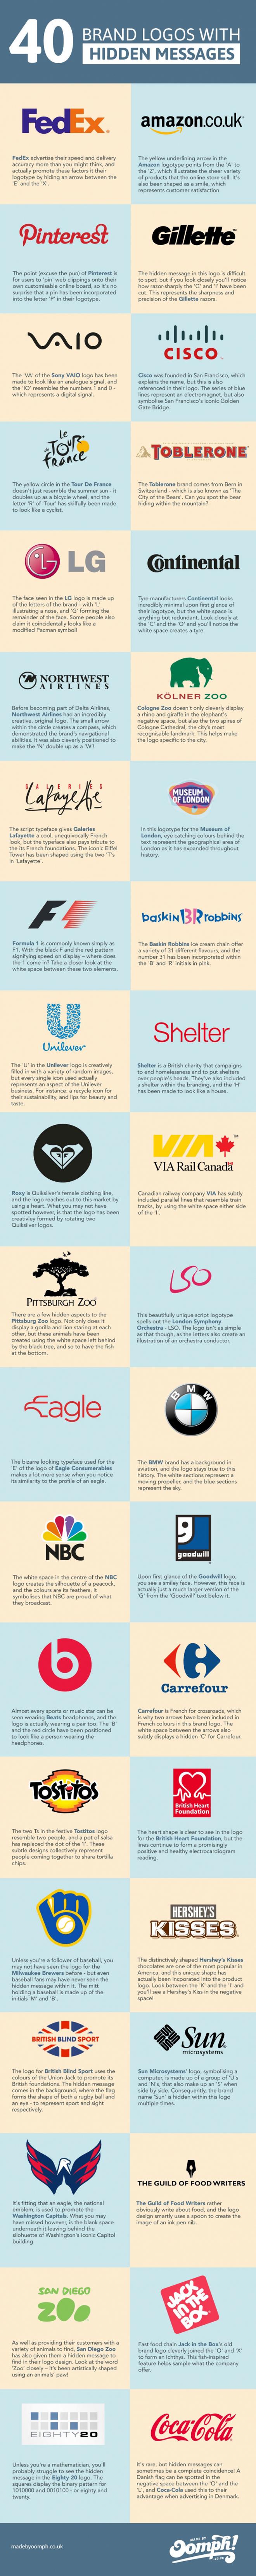 40-logos-with-hidden-messages